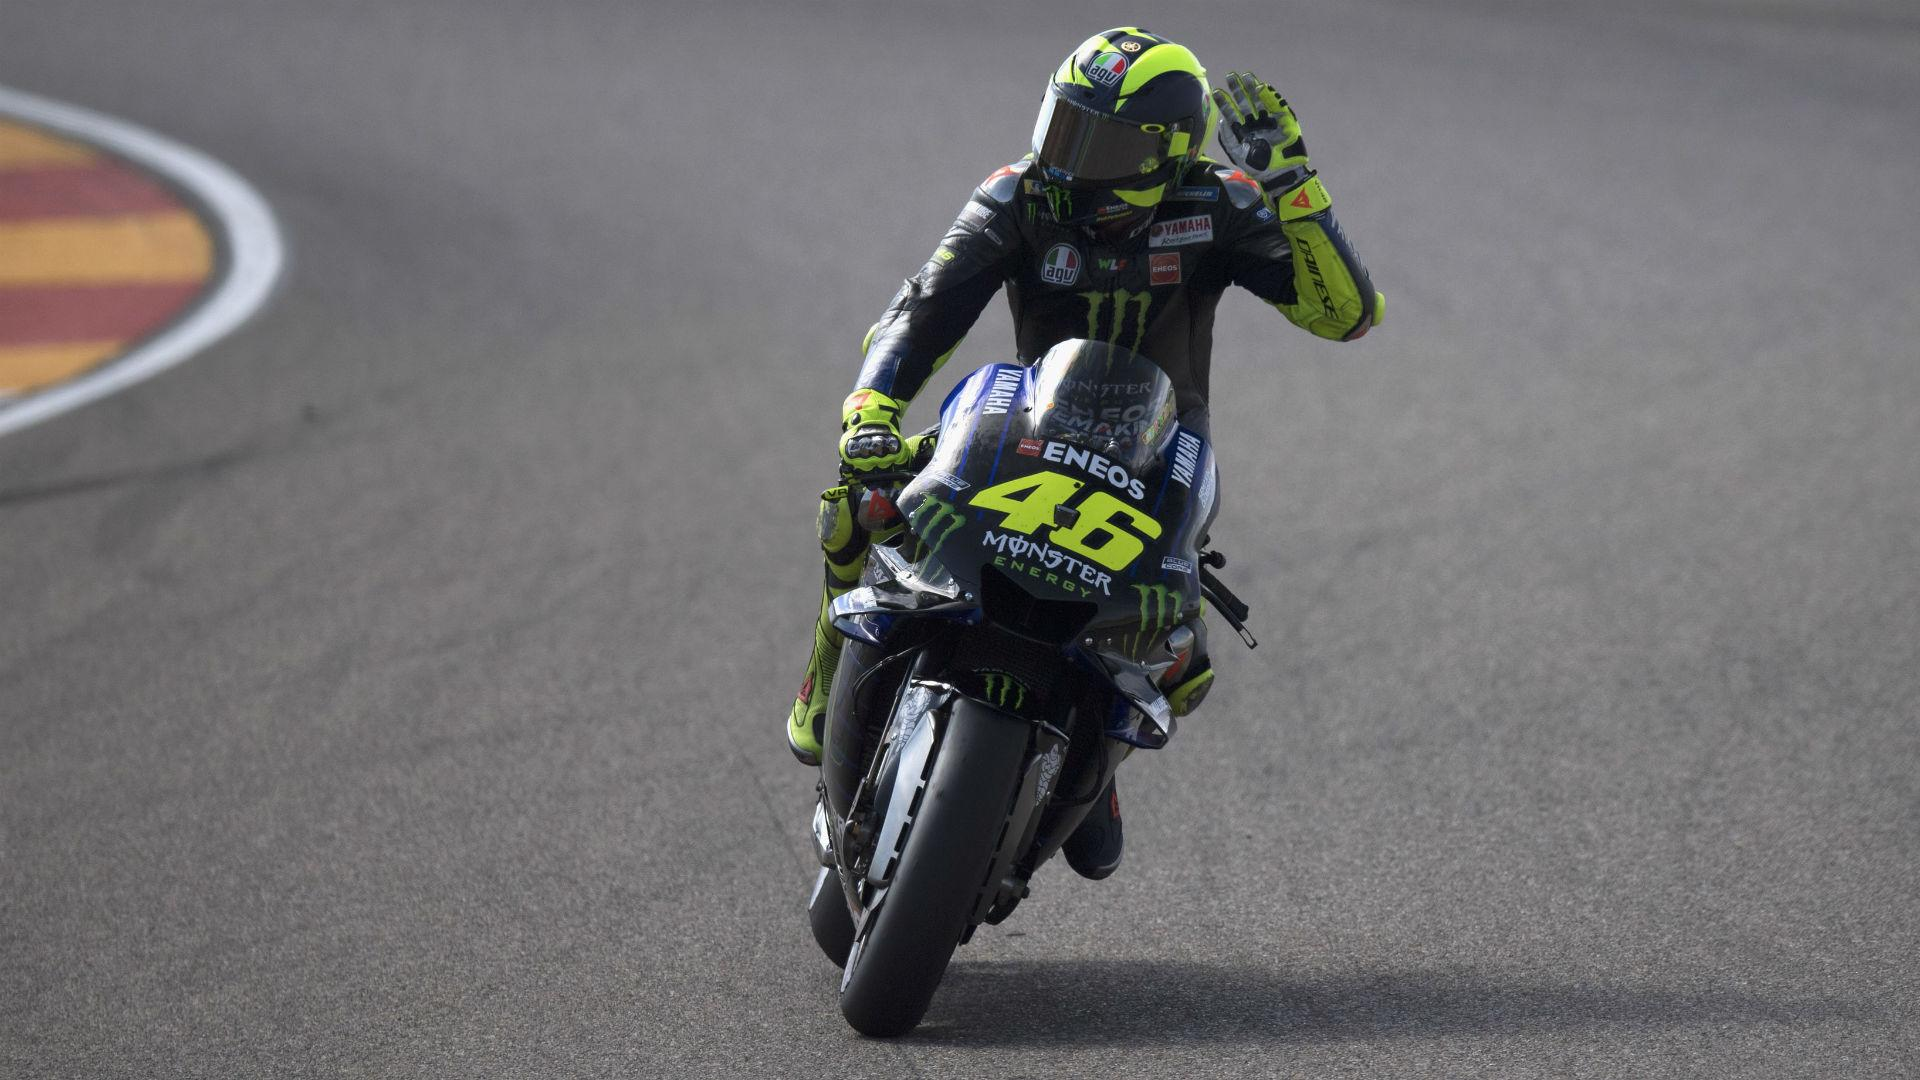 Valentino Rossi I Ll Have To Make Decision On Motogp Future Before 2020 Season Starts